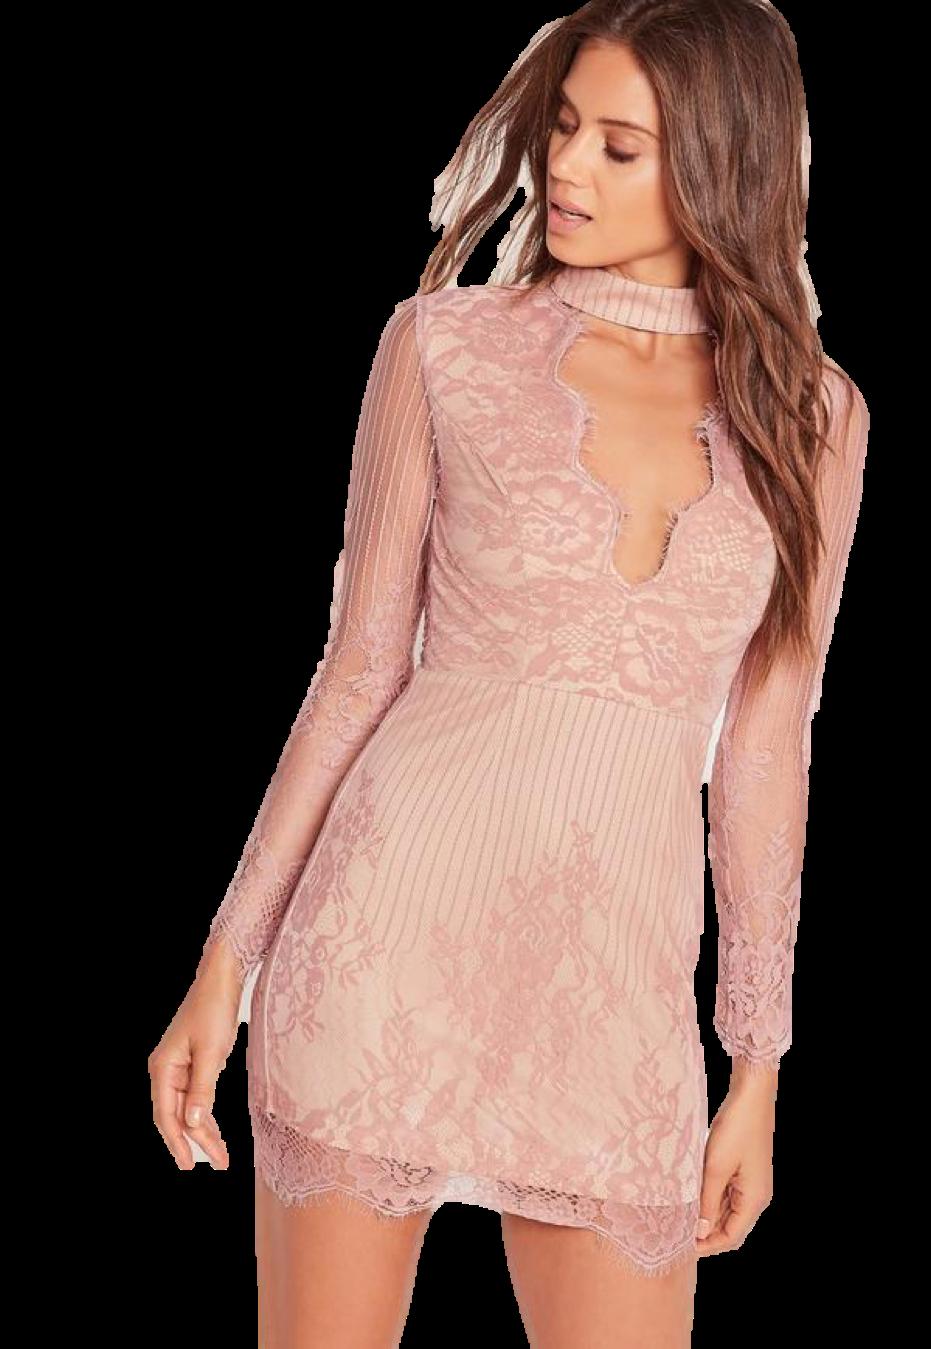 mg dress.png